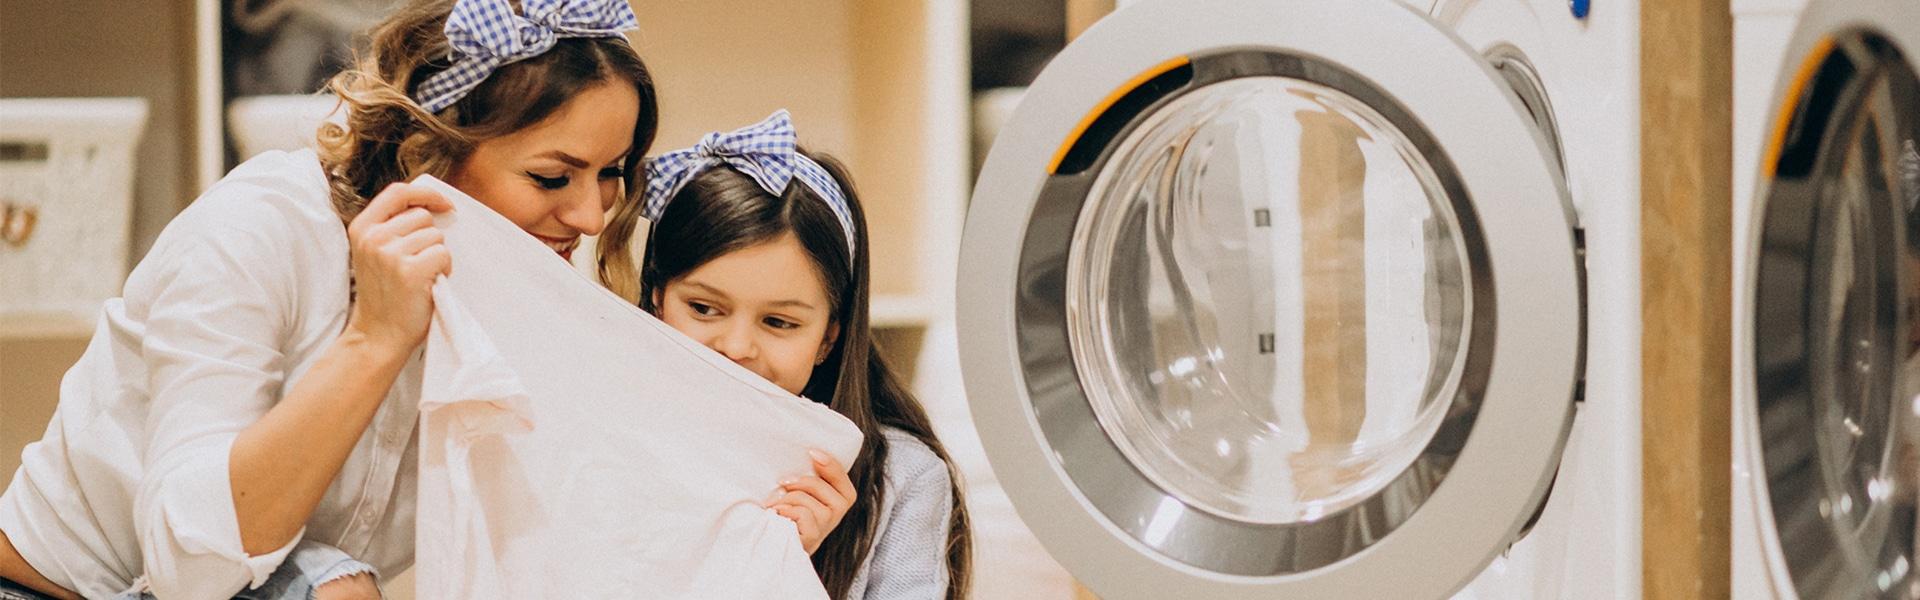 Bedrijfskleding wassen corona